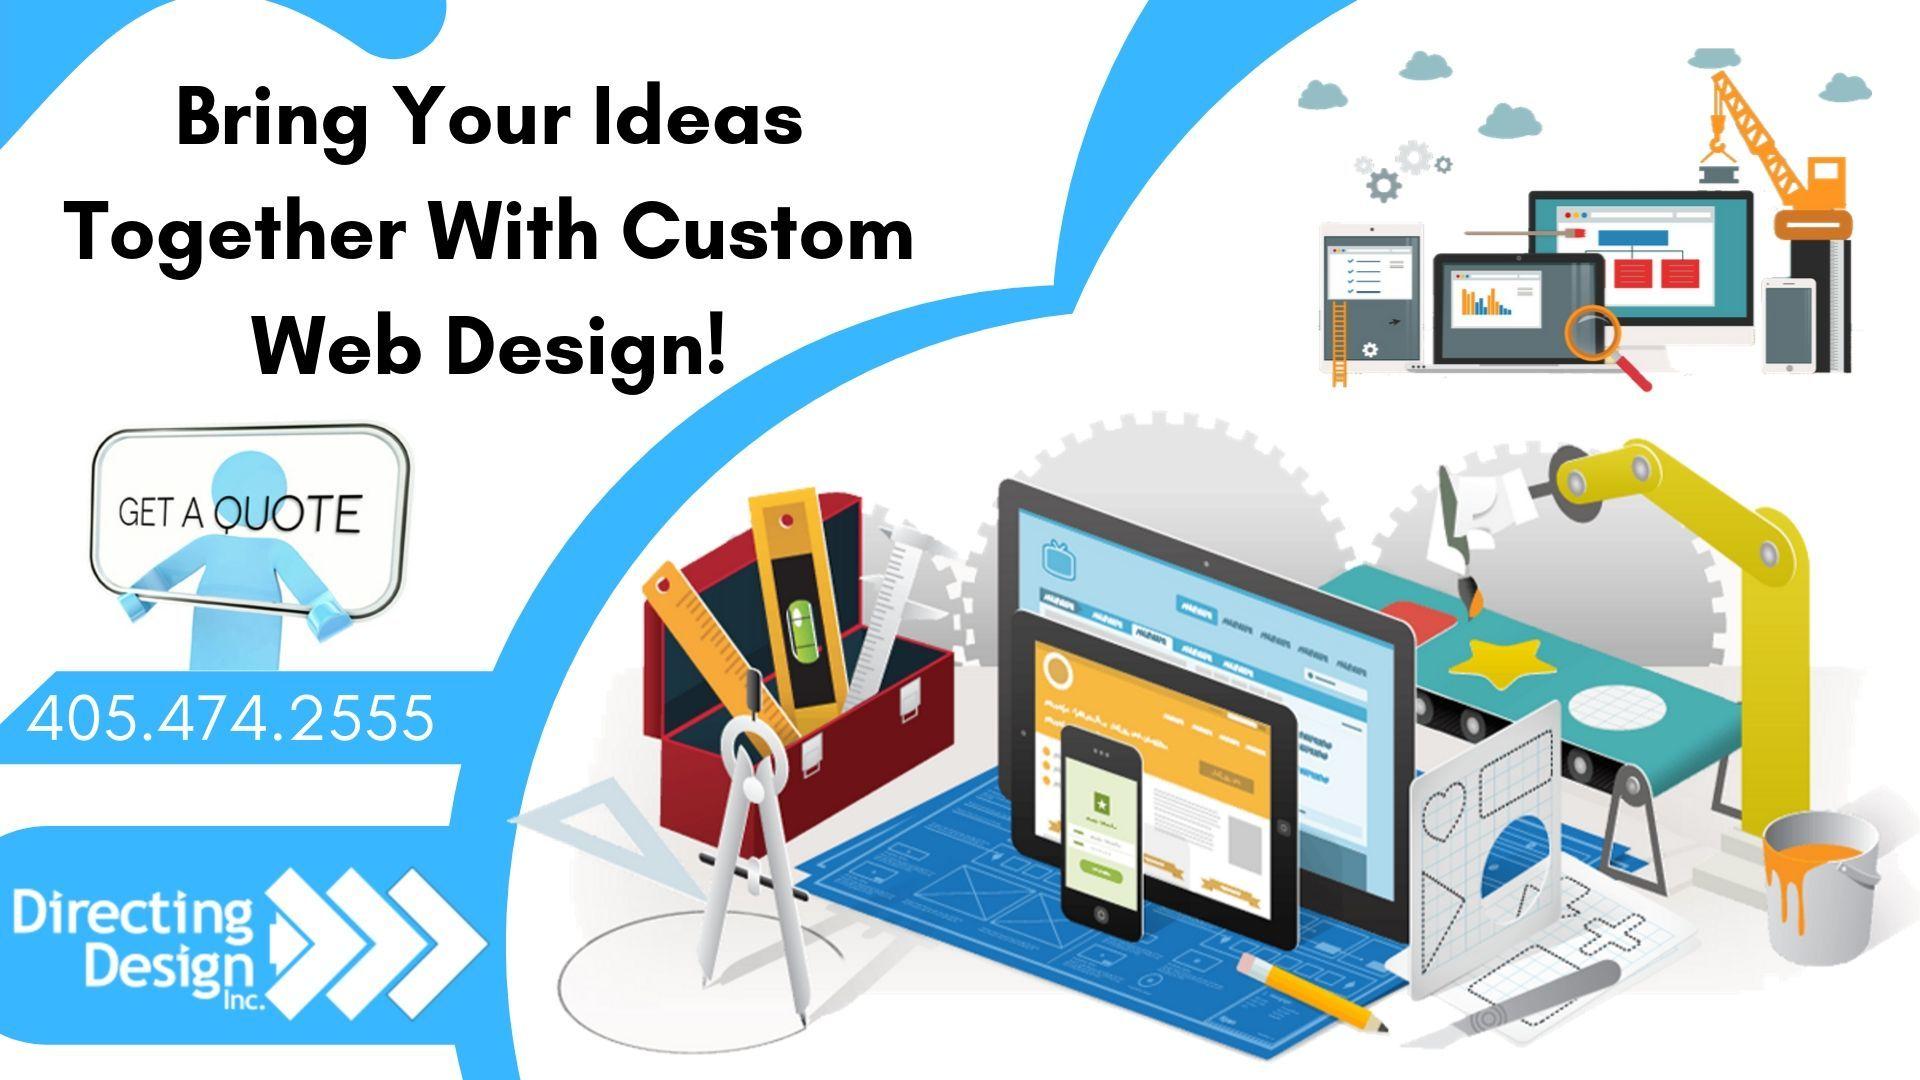 Custom Web Development Company Custom Web Design Web Design Agency Web Development Company